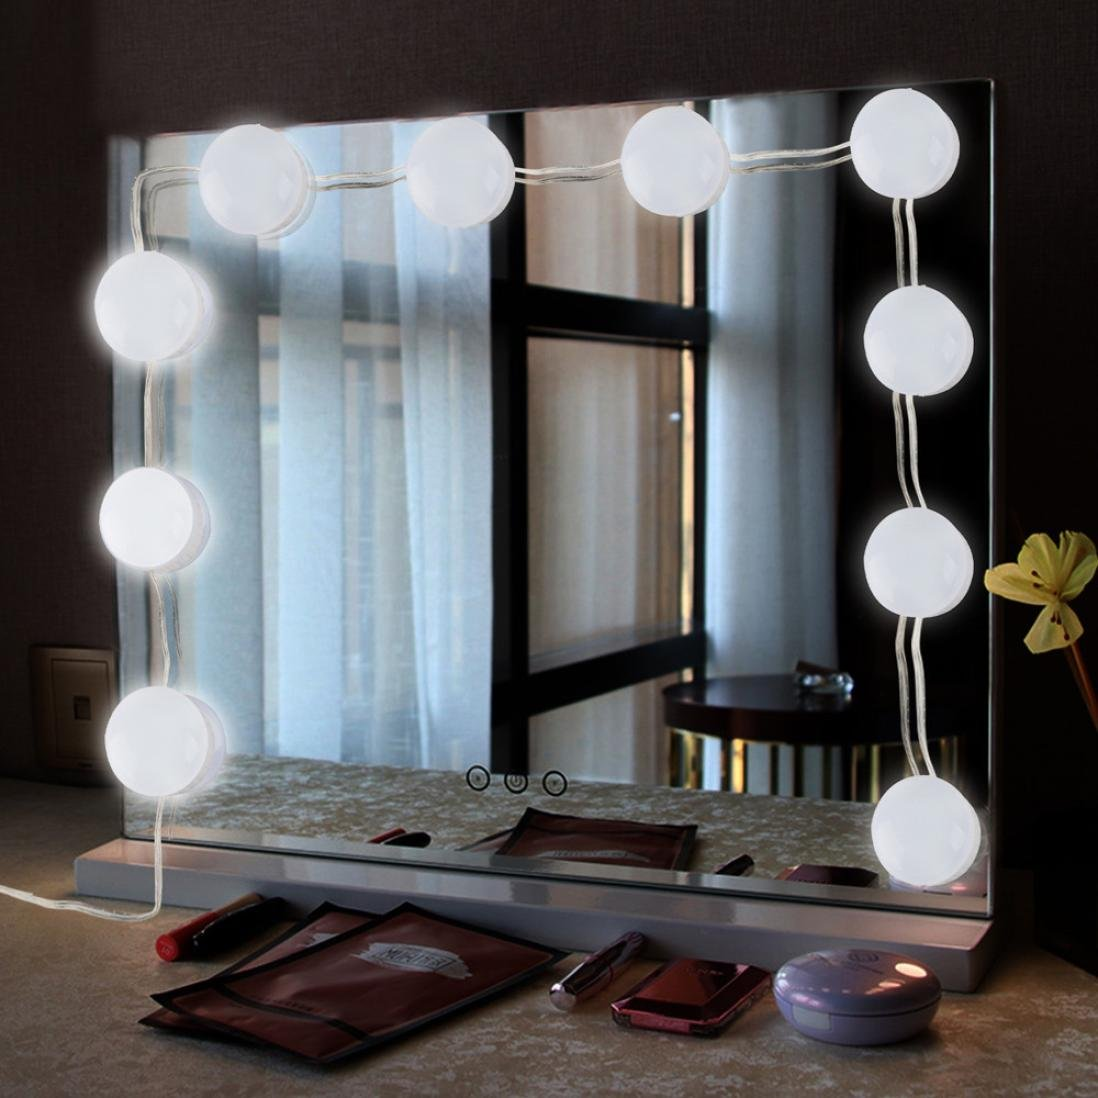 coohole LEDバニティミラーライトキットを調光機能付きライト照明器具電球ストリップ、化粧台メイクアップテーブル、DIYミラー、ミラーNot Included B07FCCX7VQ  ホワイト